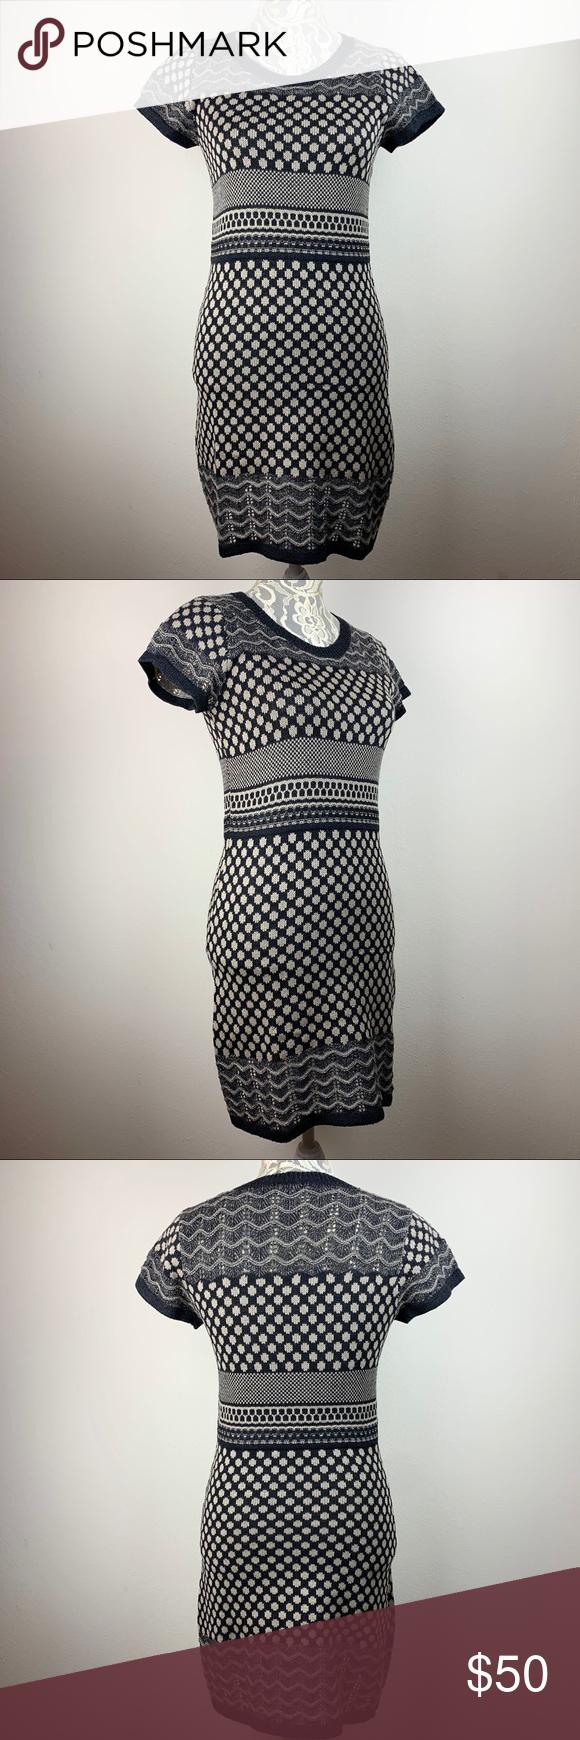 Thml Geometric Short Sleeve Sweater Dress M Short Sleeved Sweaters Sweater Dress Dresses [ 1740 x 580 Pixel ]